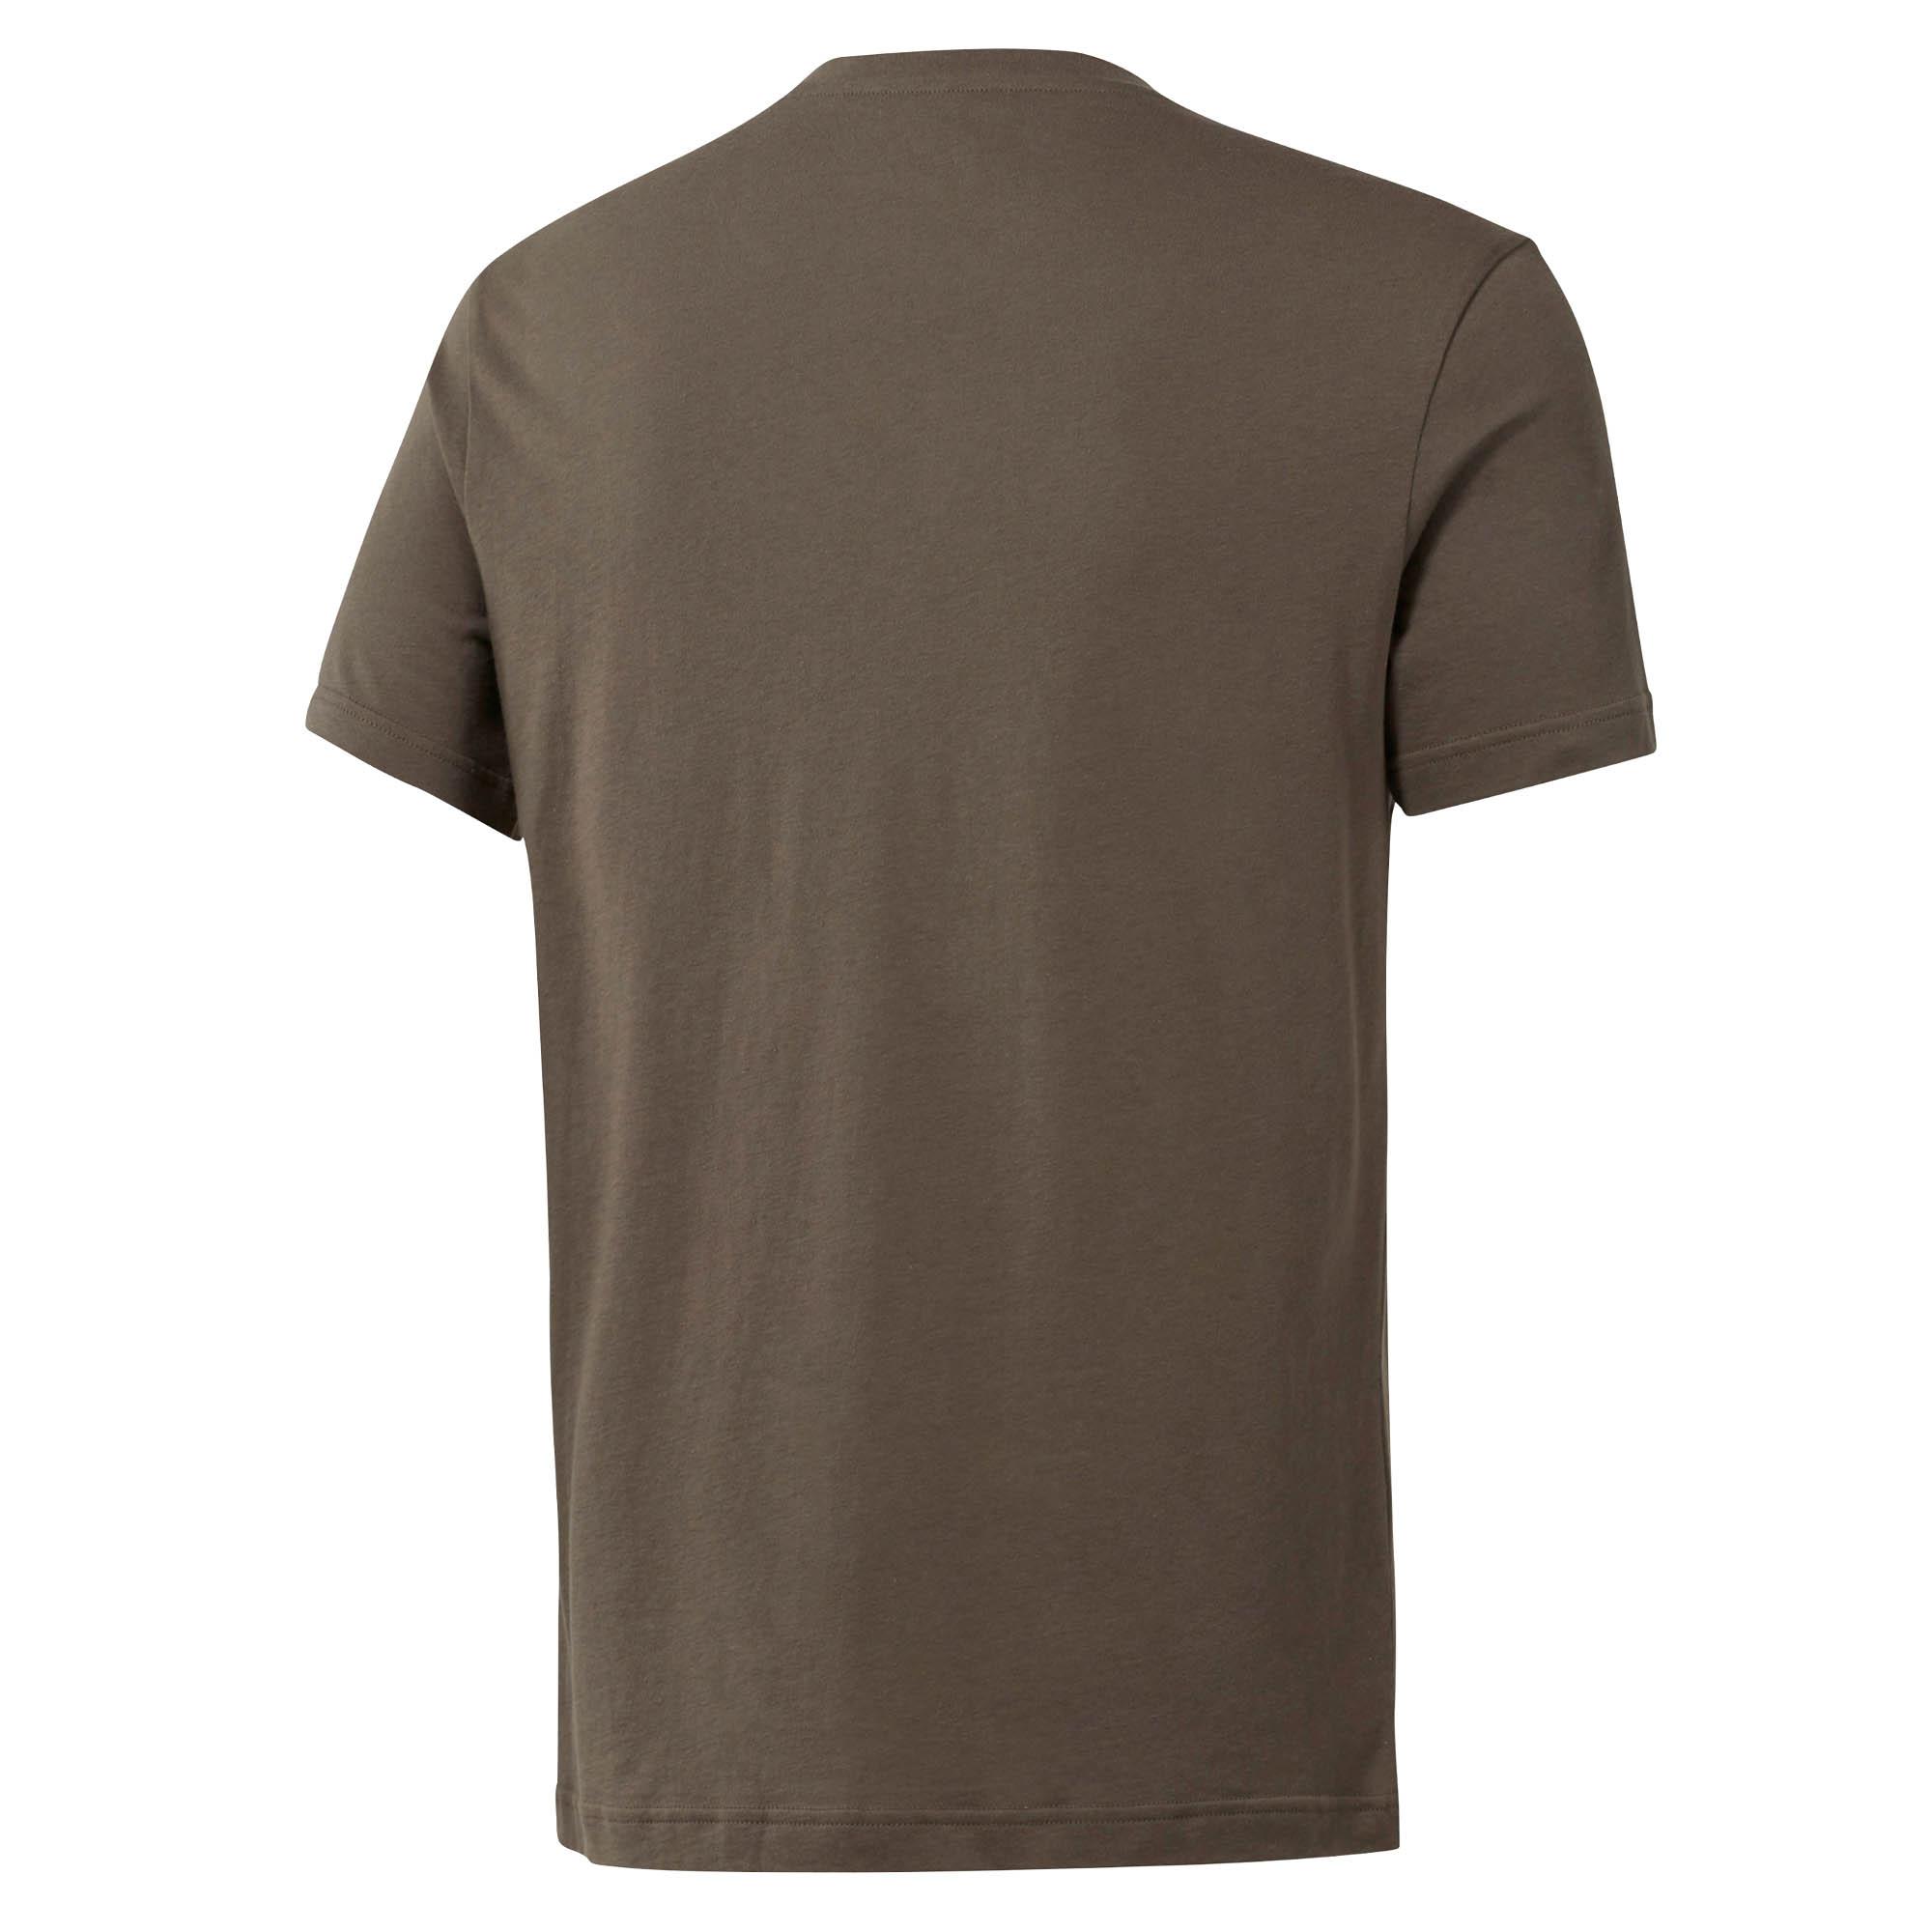 Reebok-UFC-MMA-Logo-Mens-Training-Fitness-Fight-T-Shirt-Tee-Khaki thumbnail 4